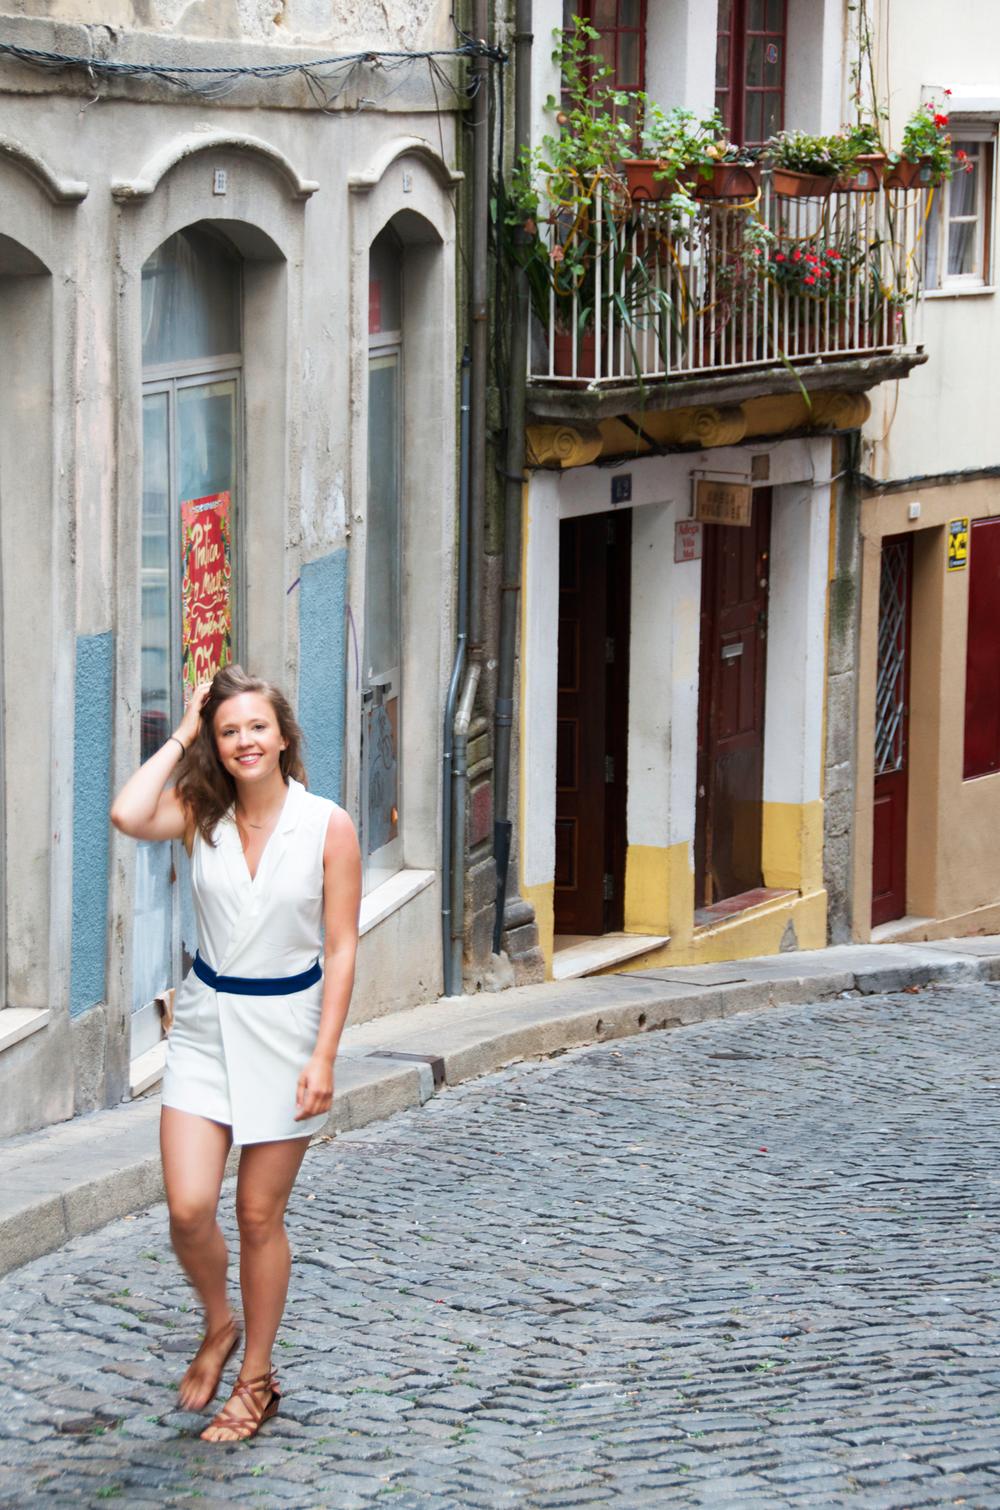 streets-of-porto-jessica-janusz.png